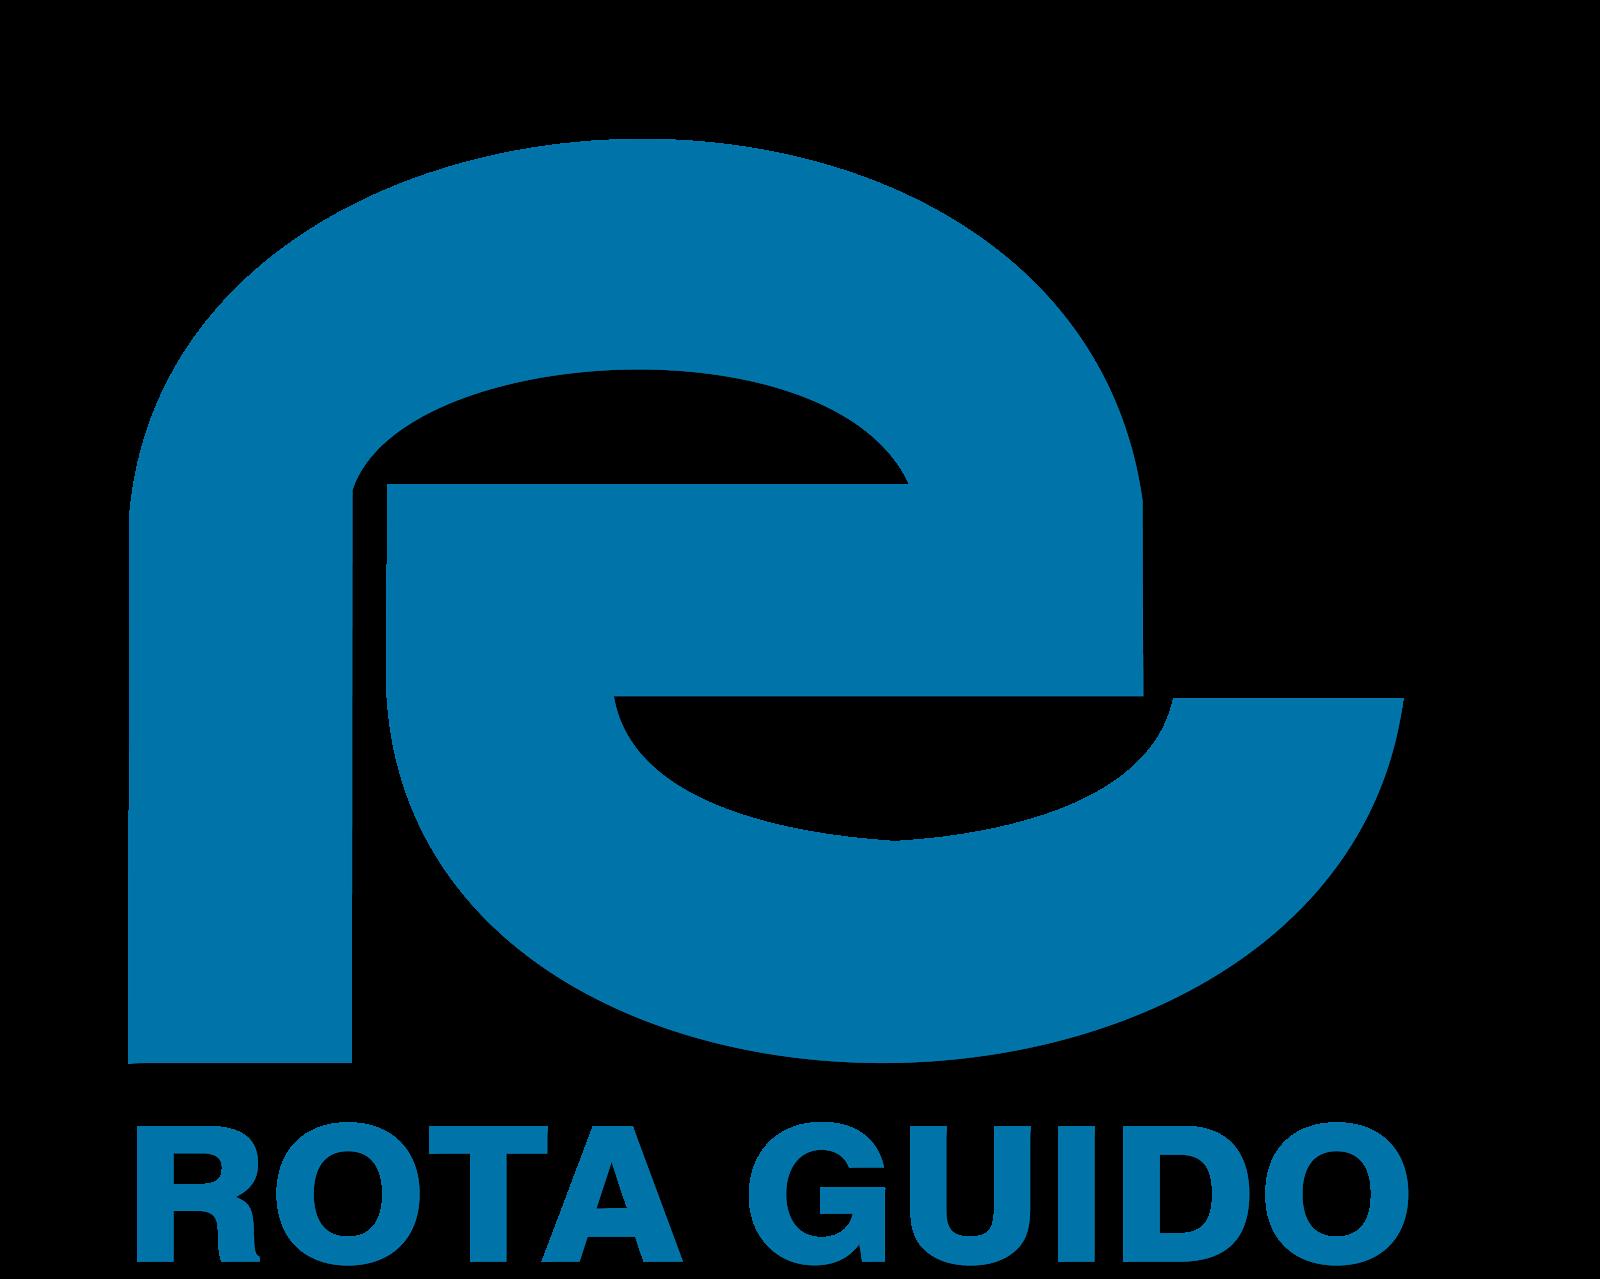 ROTA GUIDO